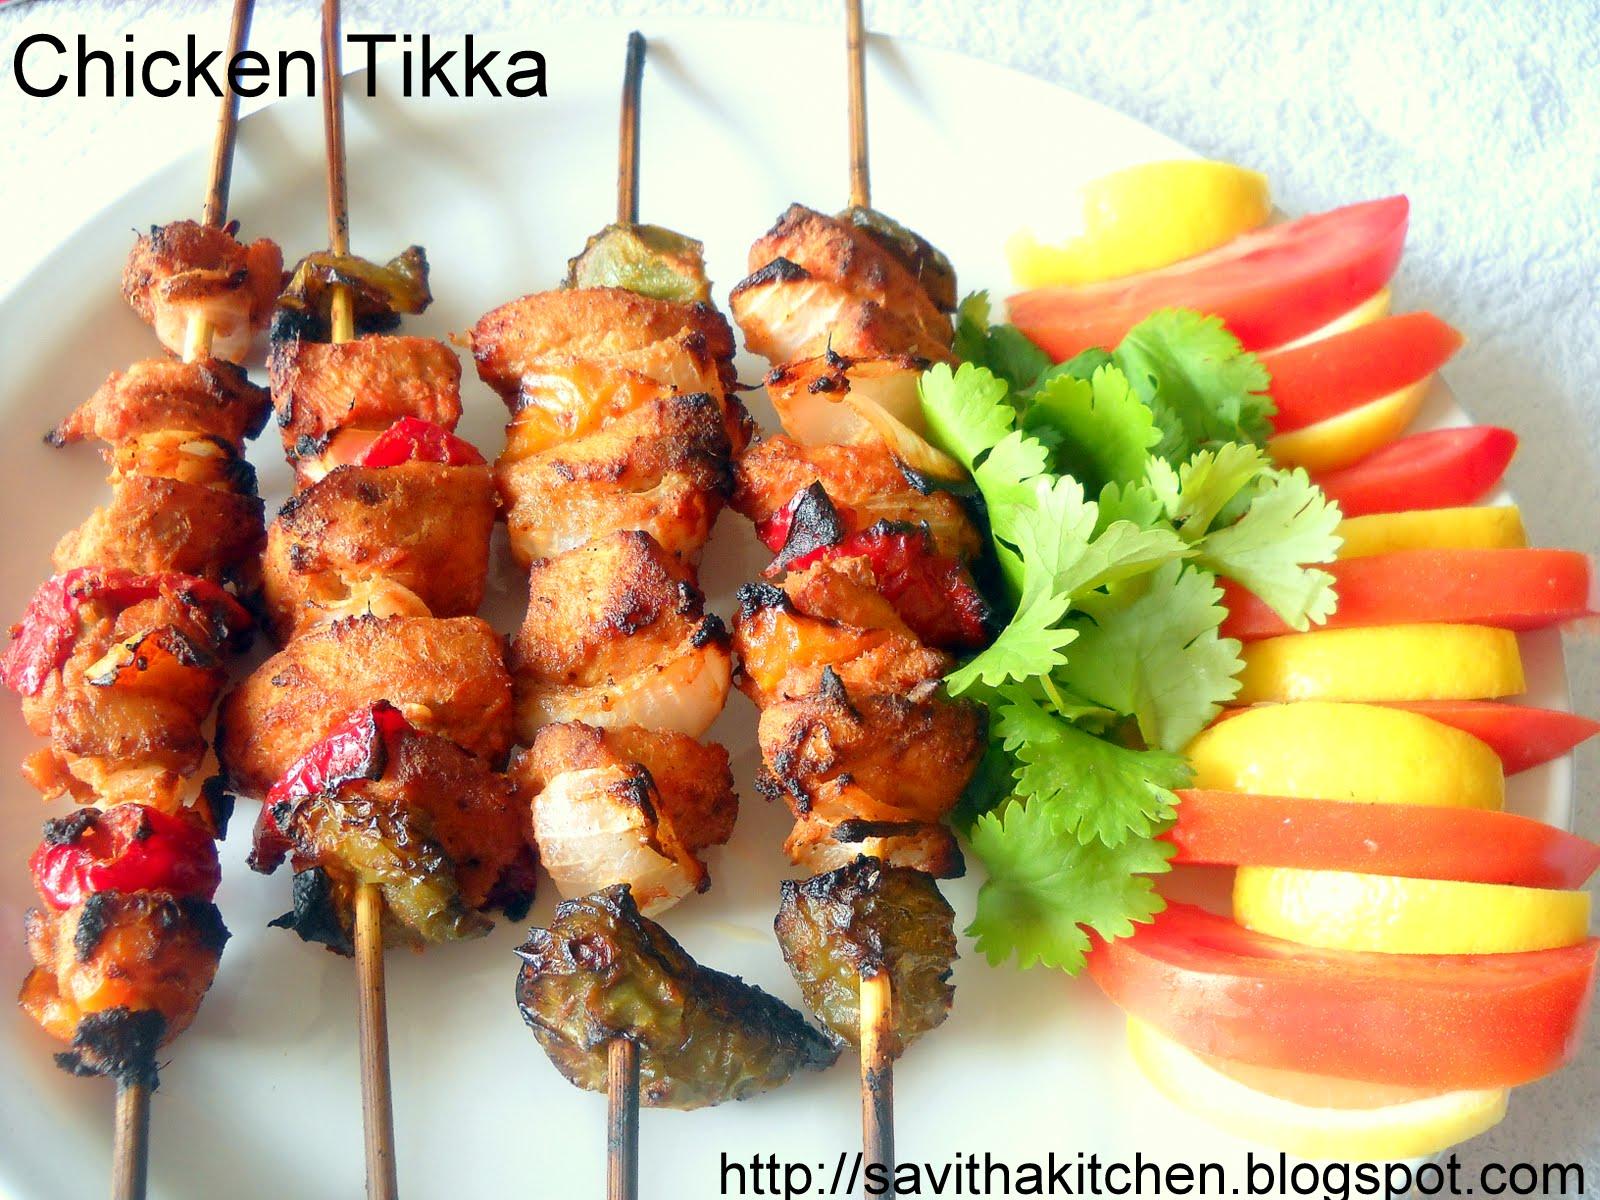 Savitha's Kitchen: Chicken Tikka